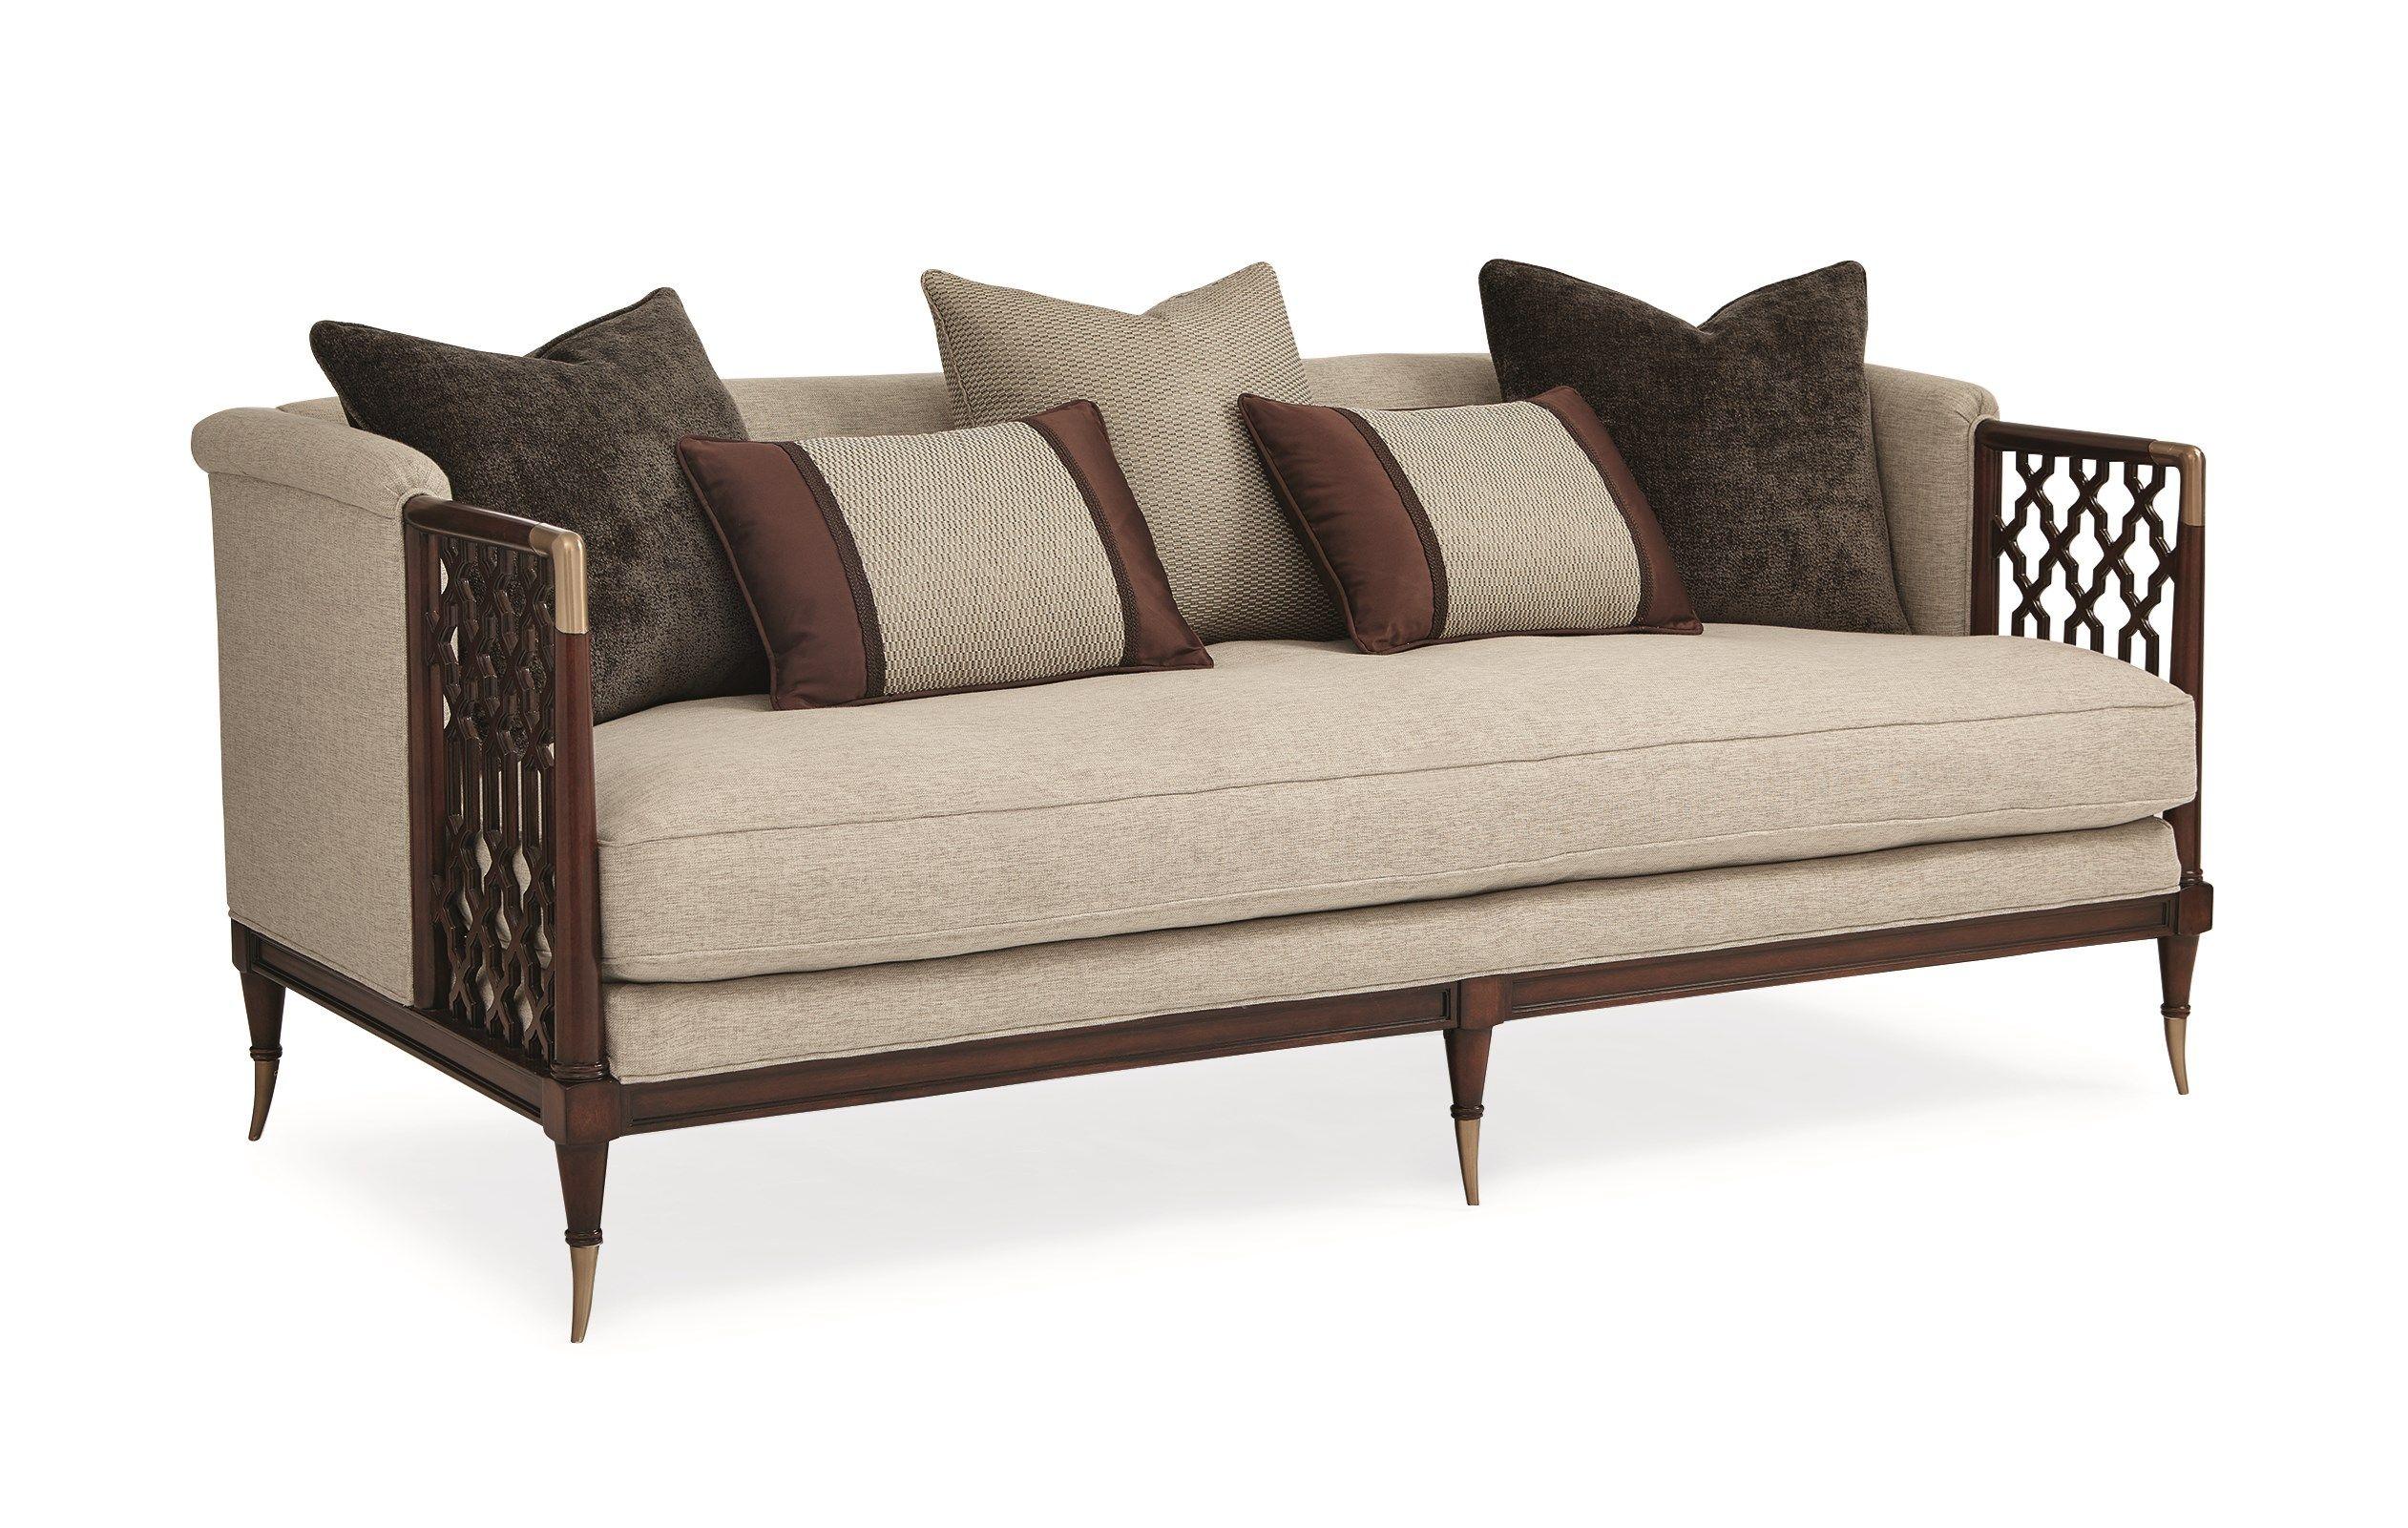 Uph Sofwoo 35b Jpg 2523 1601 Sofa Design Caracole Furniture Upholstered Sofa